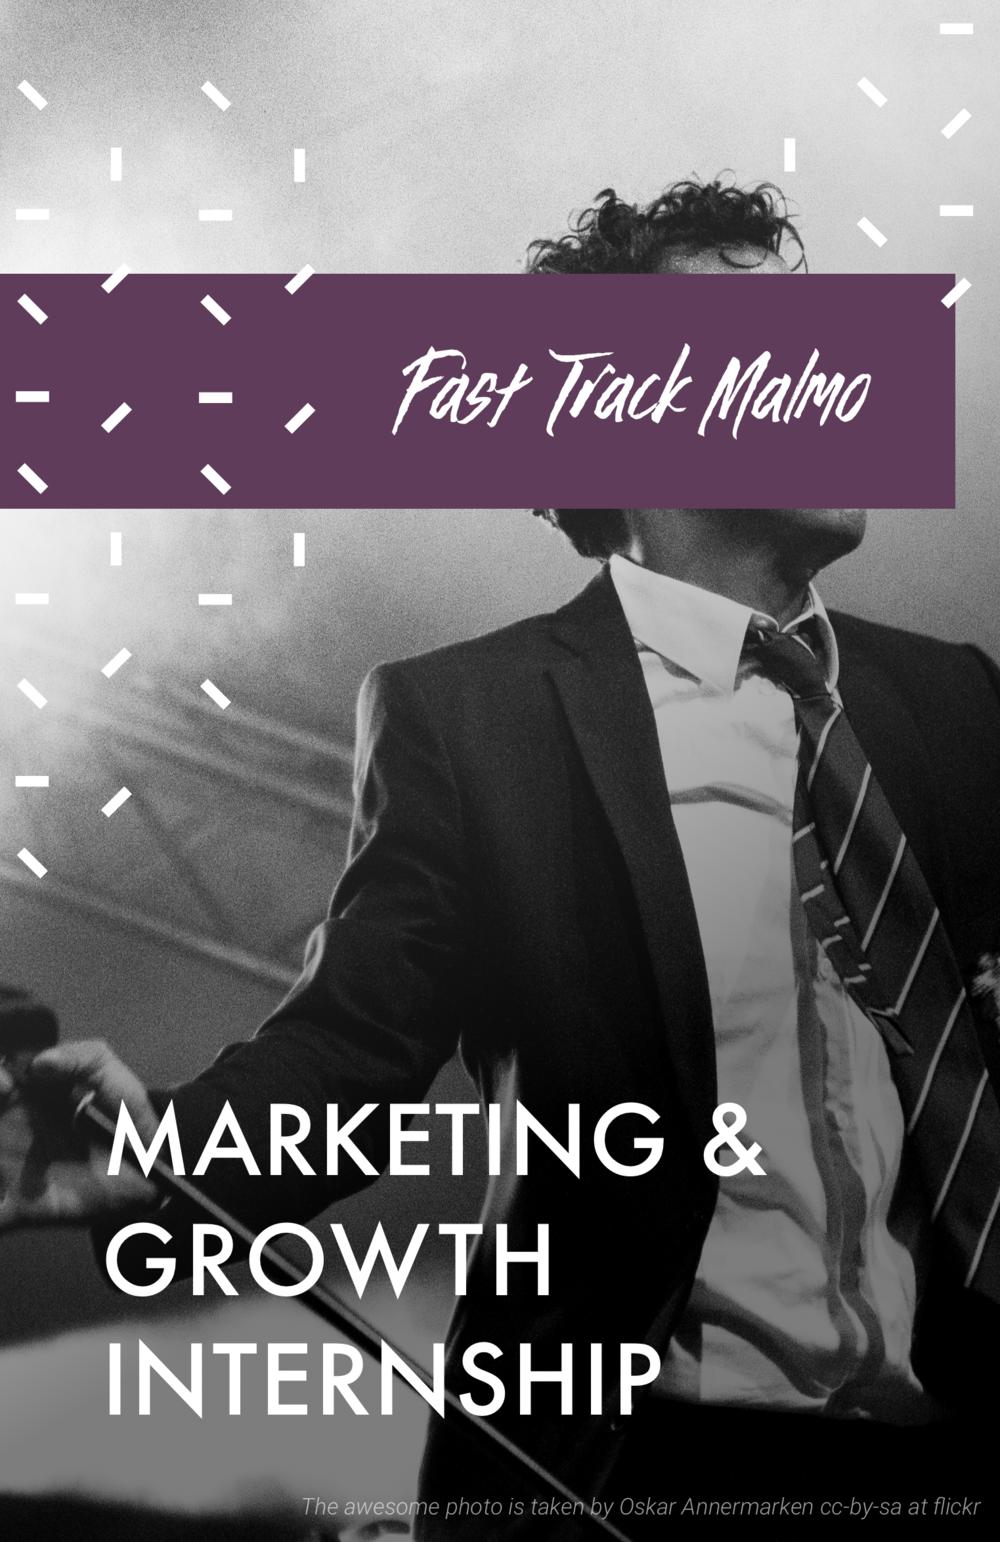 Fast Track Malmö - Intern Ad - Marketing & Growth.png